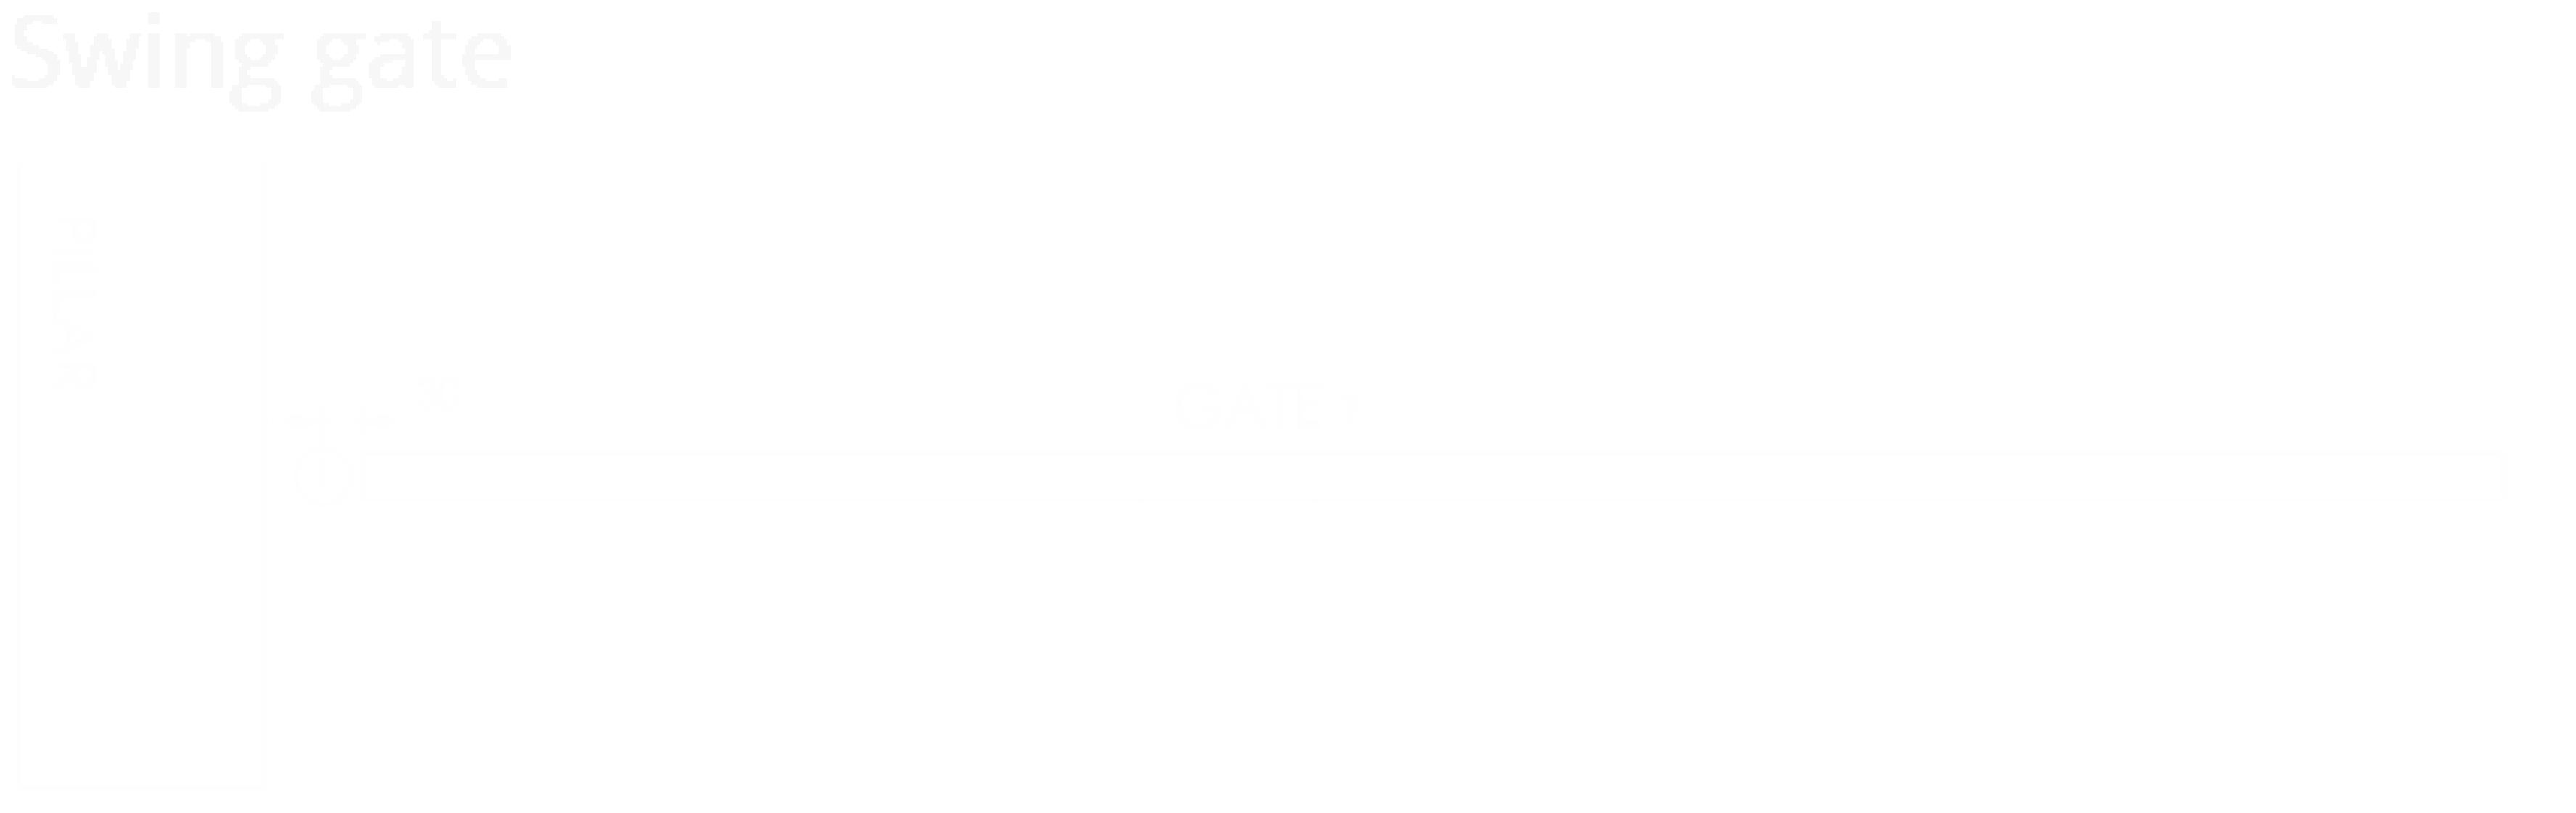 Underground Type Swing Auto Gate System